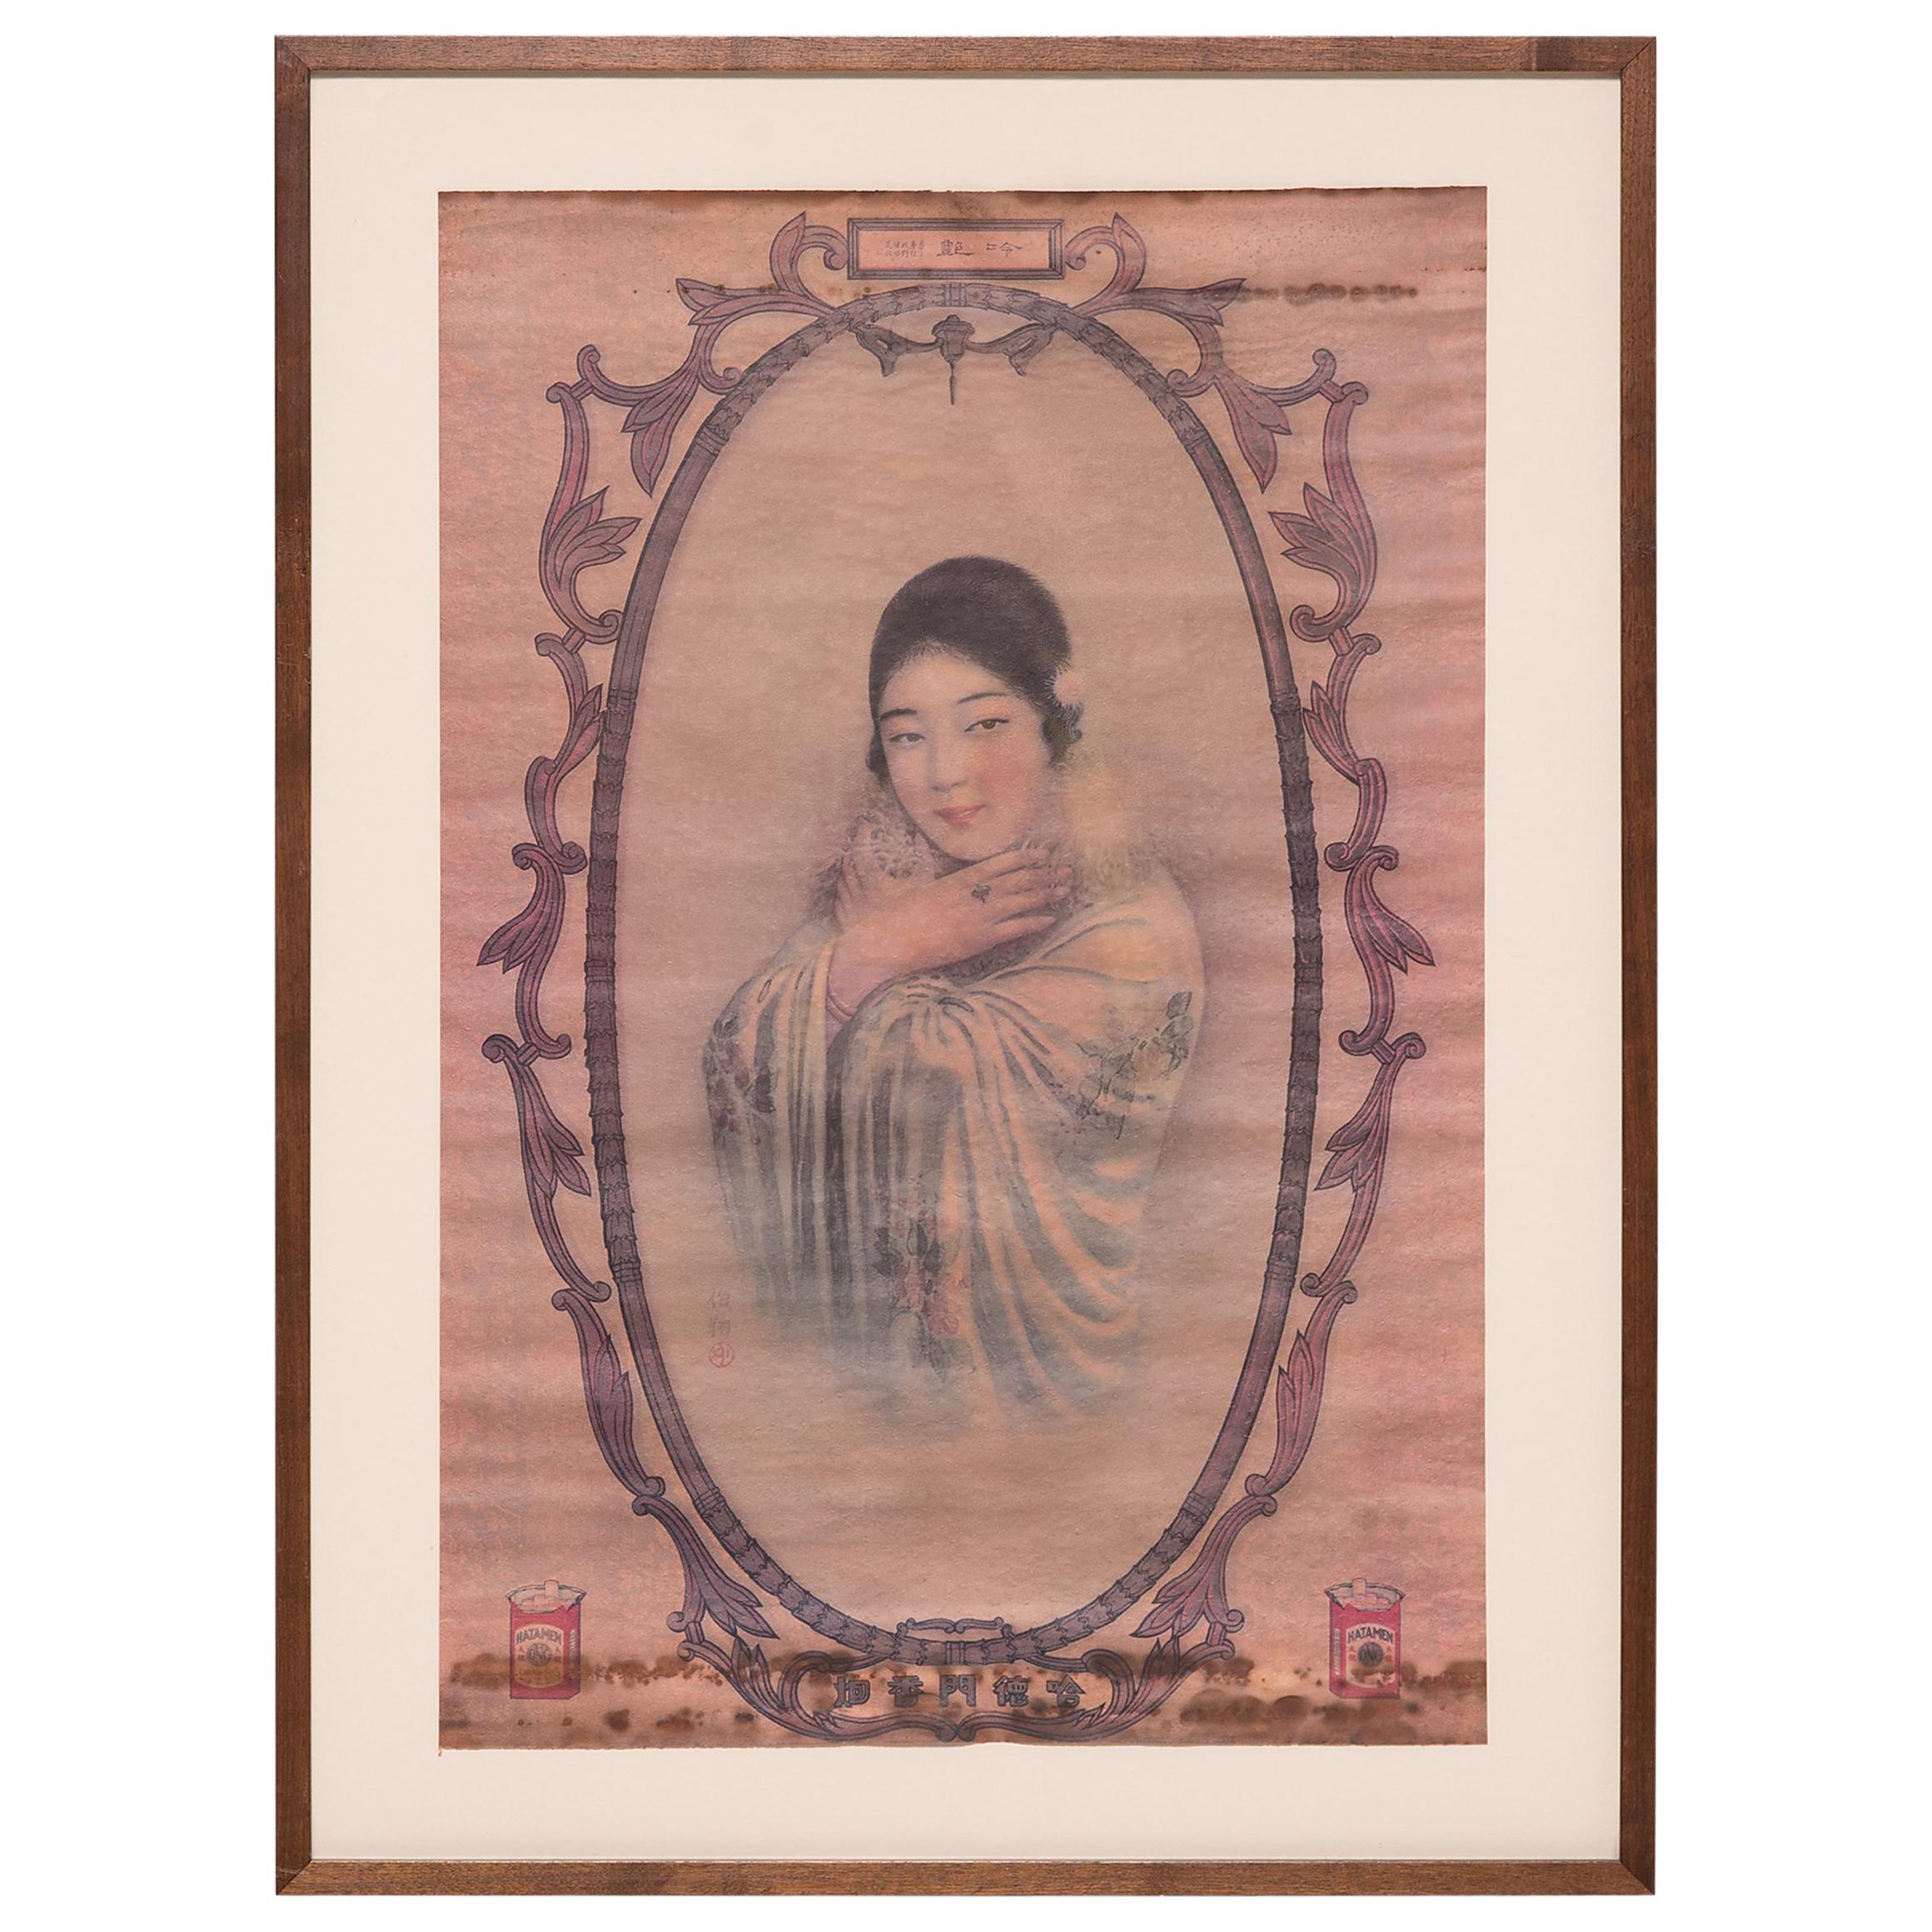 Vintage Chinese Hatamen Cigarettes Advertisement Poster